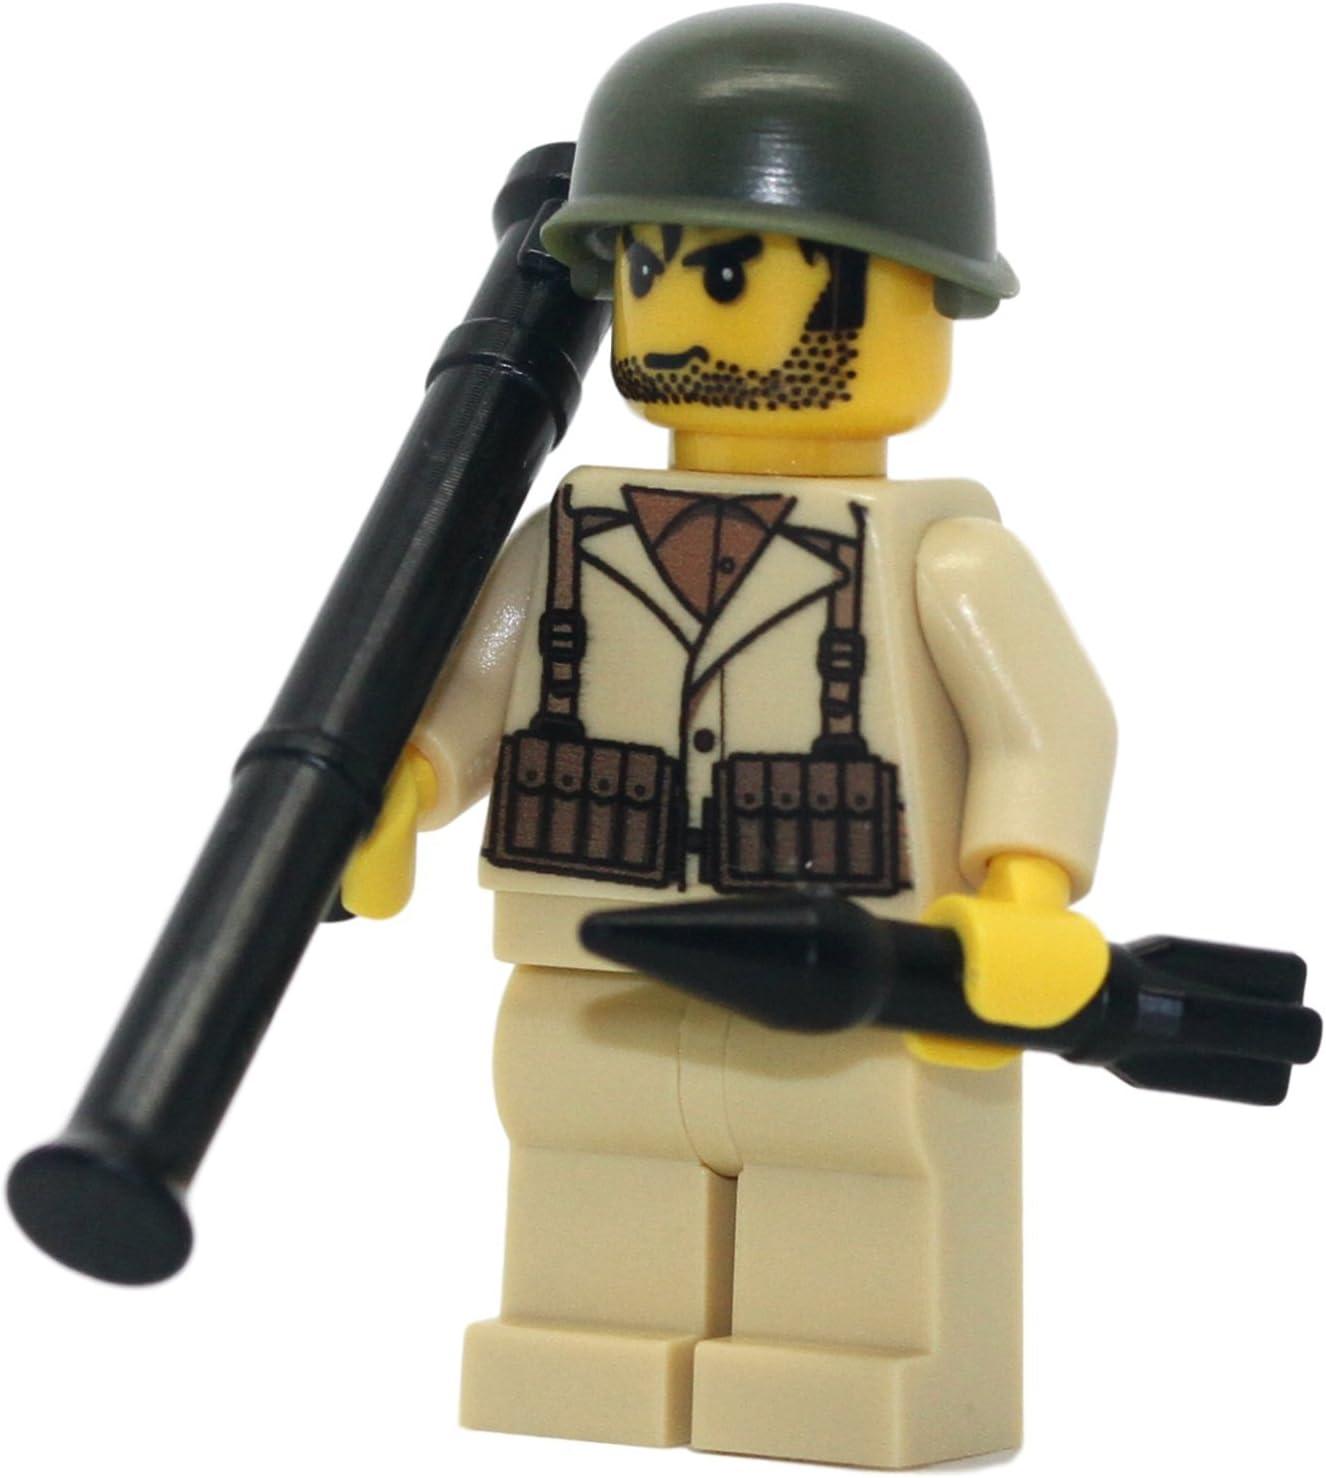 WW2 CUSTOM GERMAN LOGO HELMETS X3 FOR MINI FIGURES